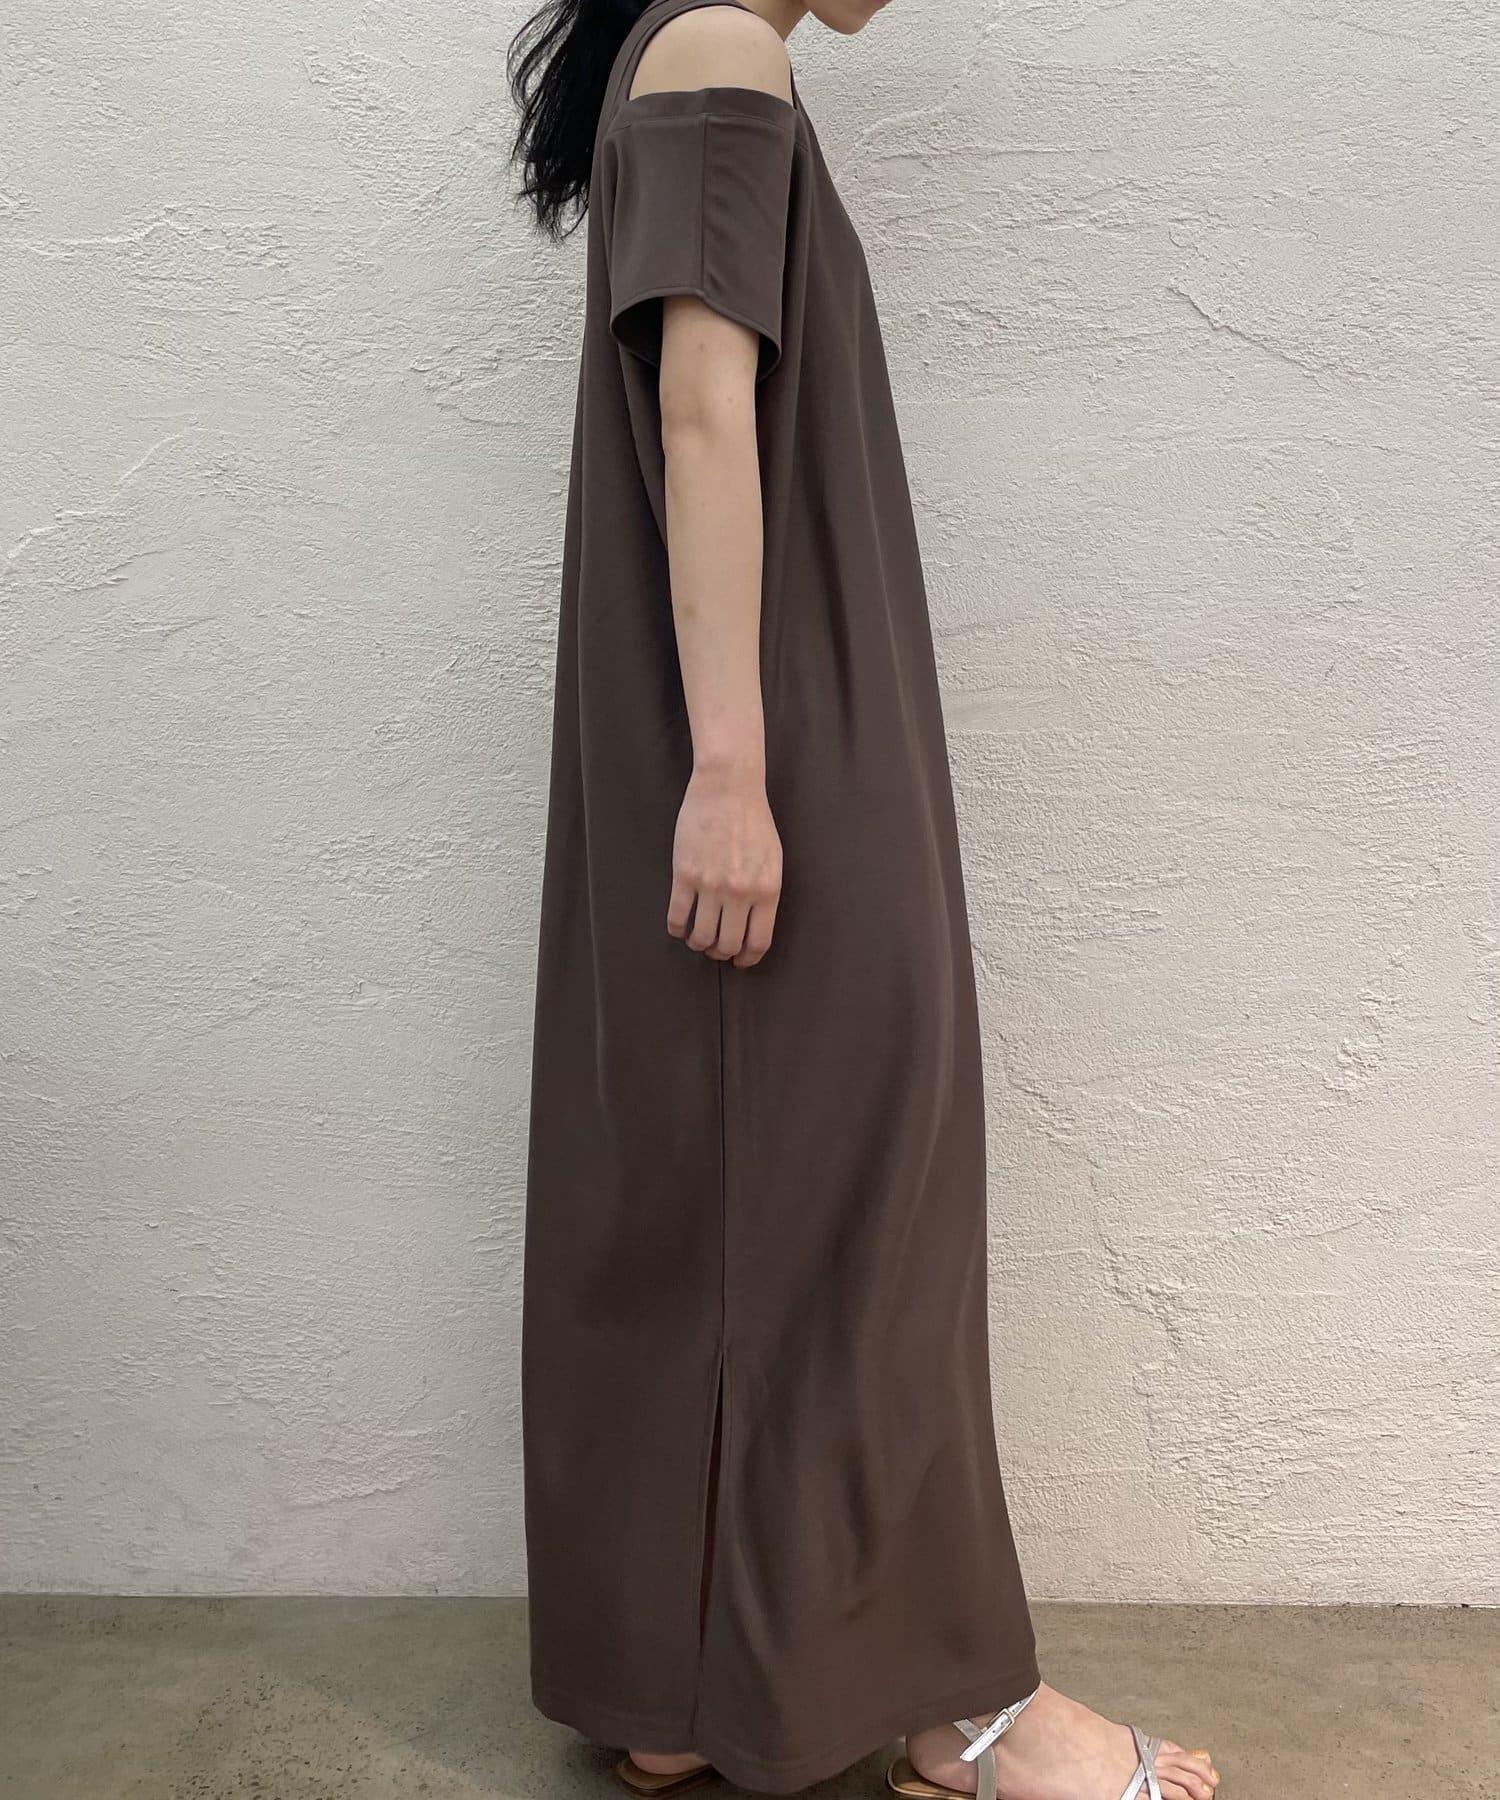 Loungedress(ラウンジドレス) 【WEB限定】オフショルマキシカットワンピース